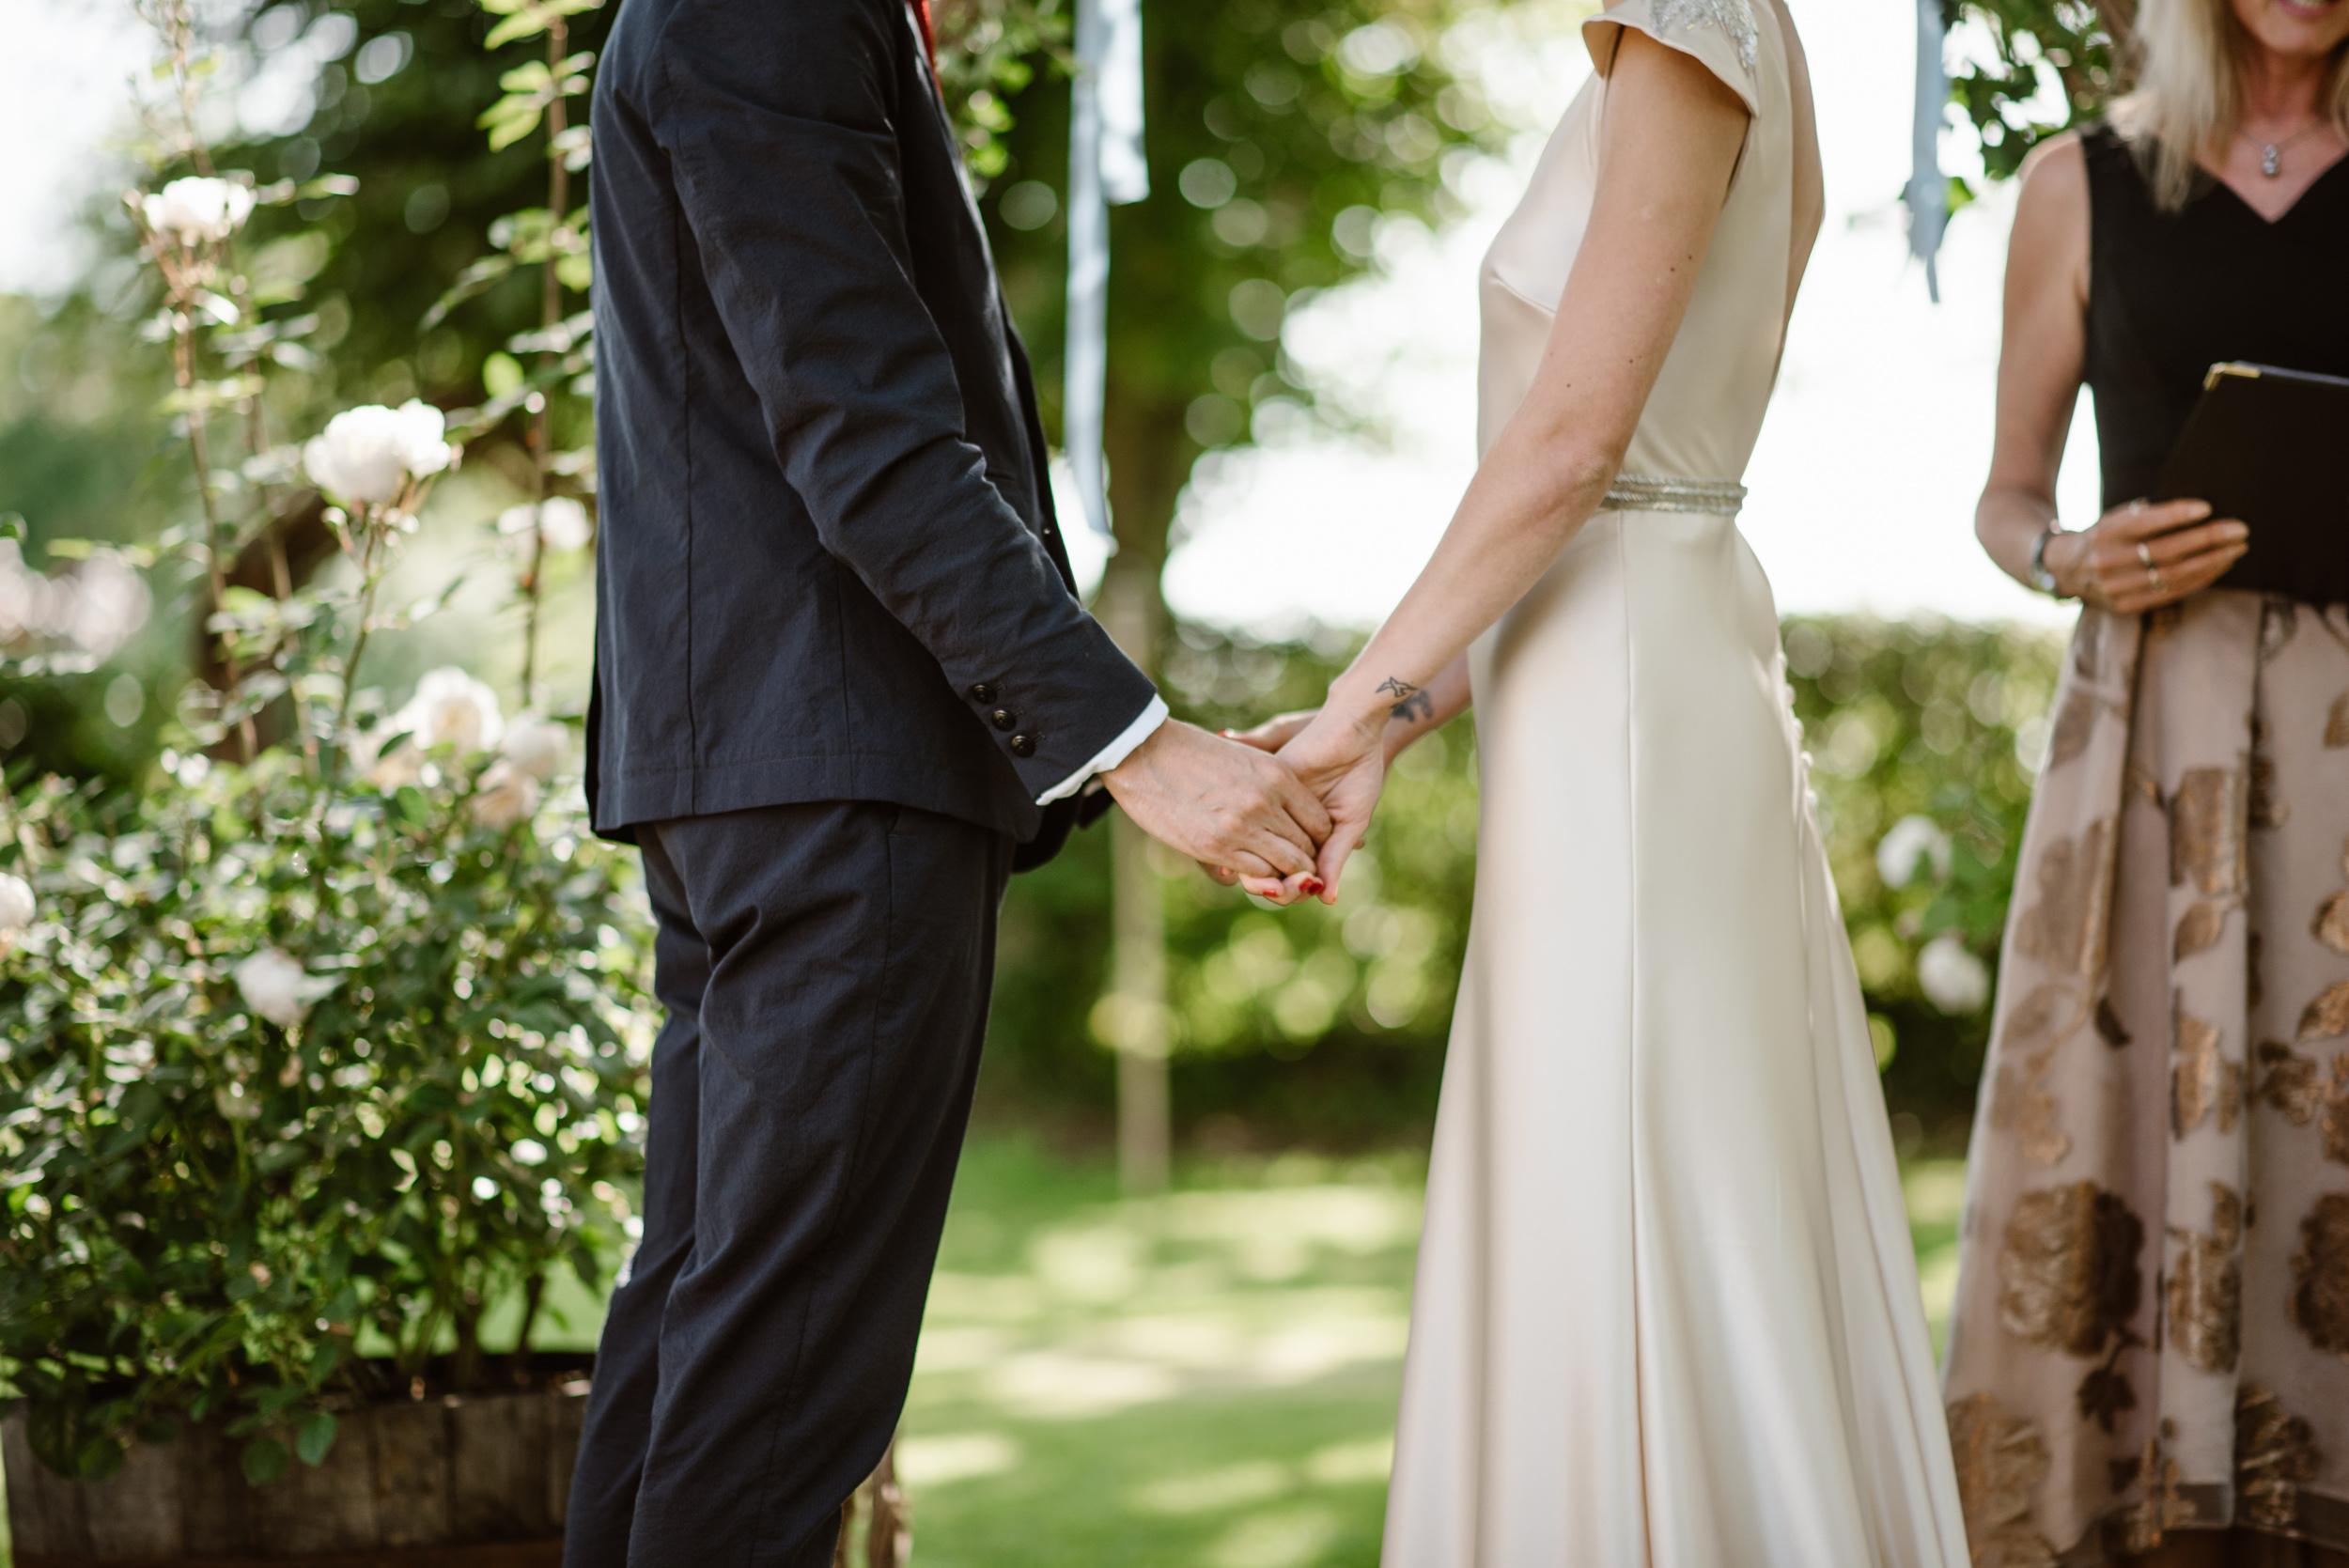 Ro-Kate-Beaumont-bias-cut-silk-wedding-gown-back-garden-wedding-by-Ellie-Gillard-5.jpg